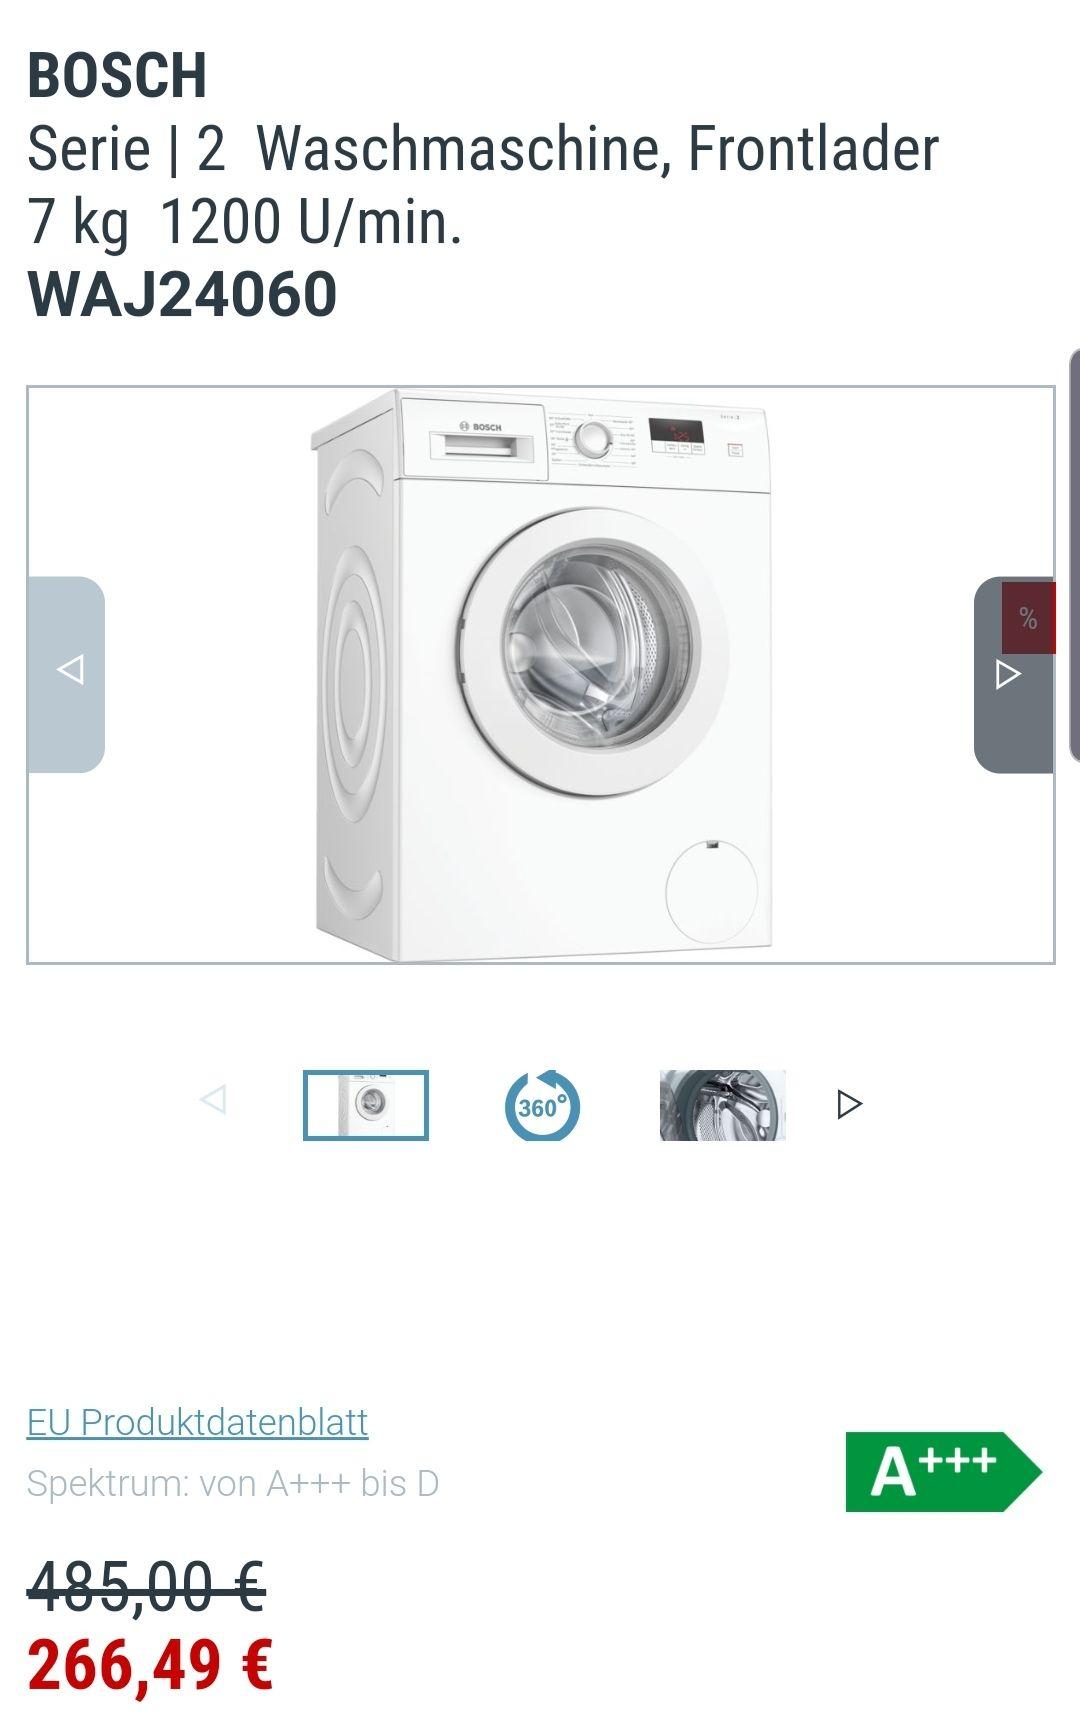 Bosch Waschmaschine WAJ 24060 7KG A+++ Frontlader